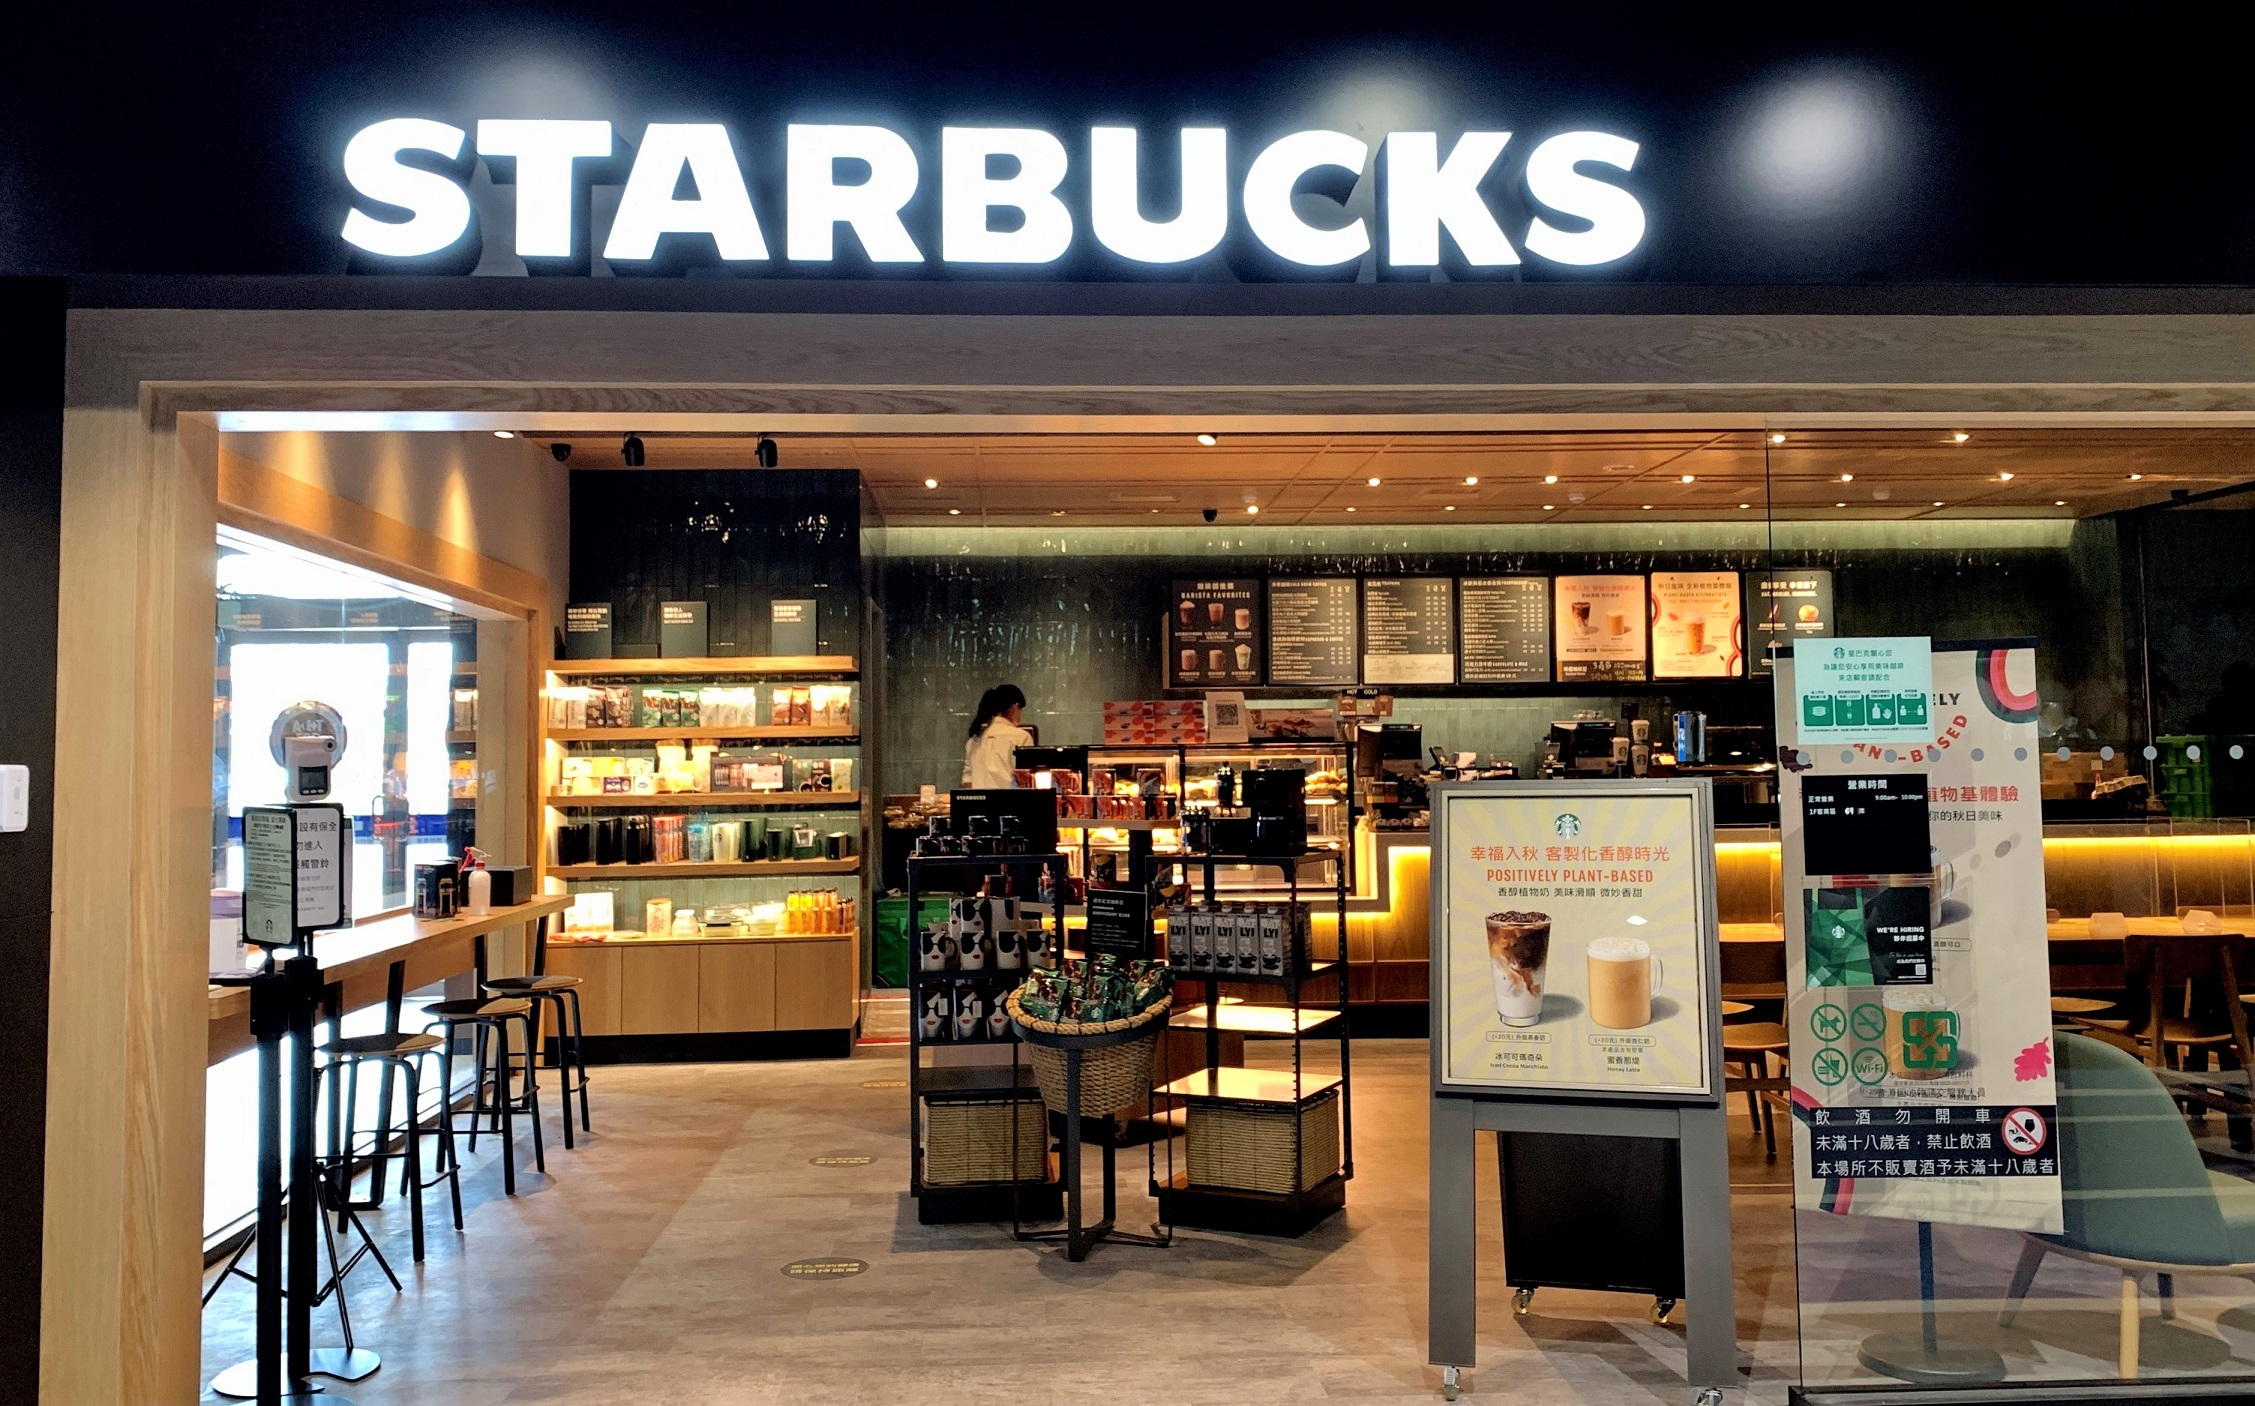 Starbucks 星巴克 》嘉義家樂福門市 盛大開幕活動!【2021/10/2 起】